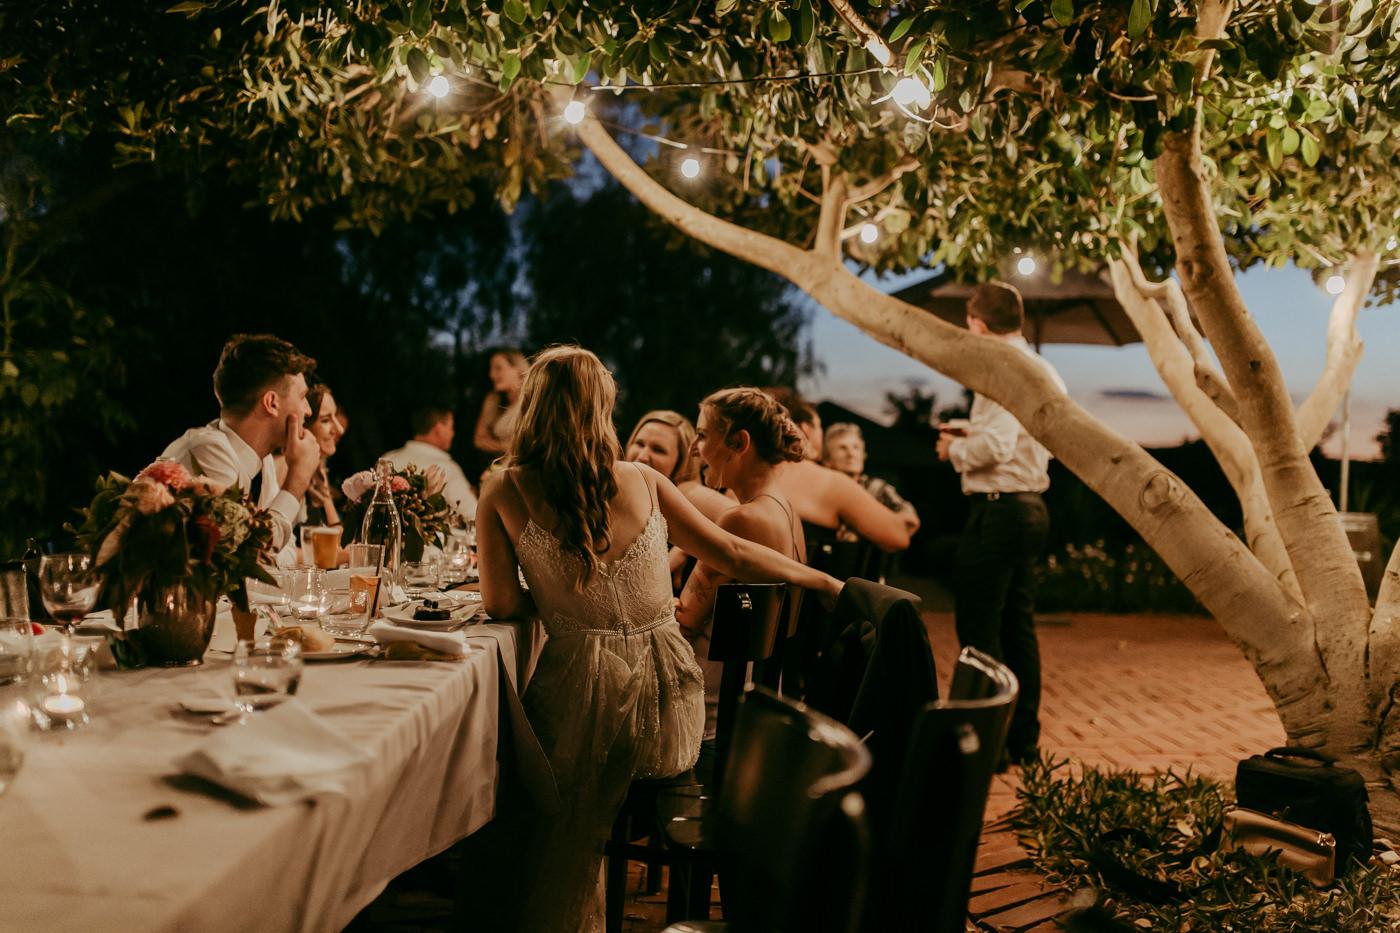 Anthony & Eliet - Wagga Wagga Wedding - Country NSW - Samantha Heather Photography-176.jpg